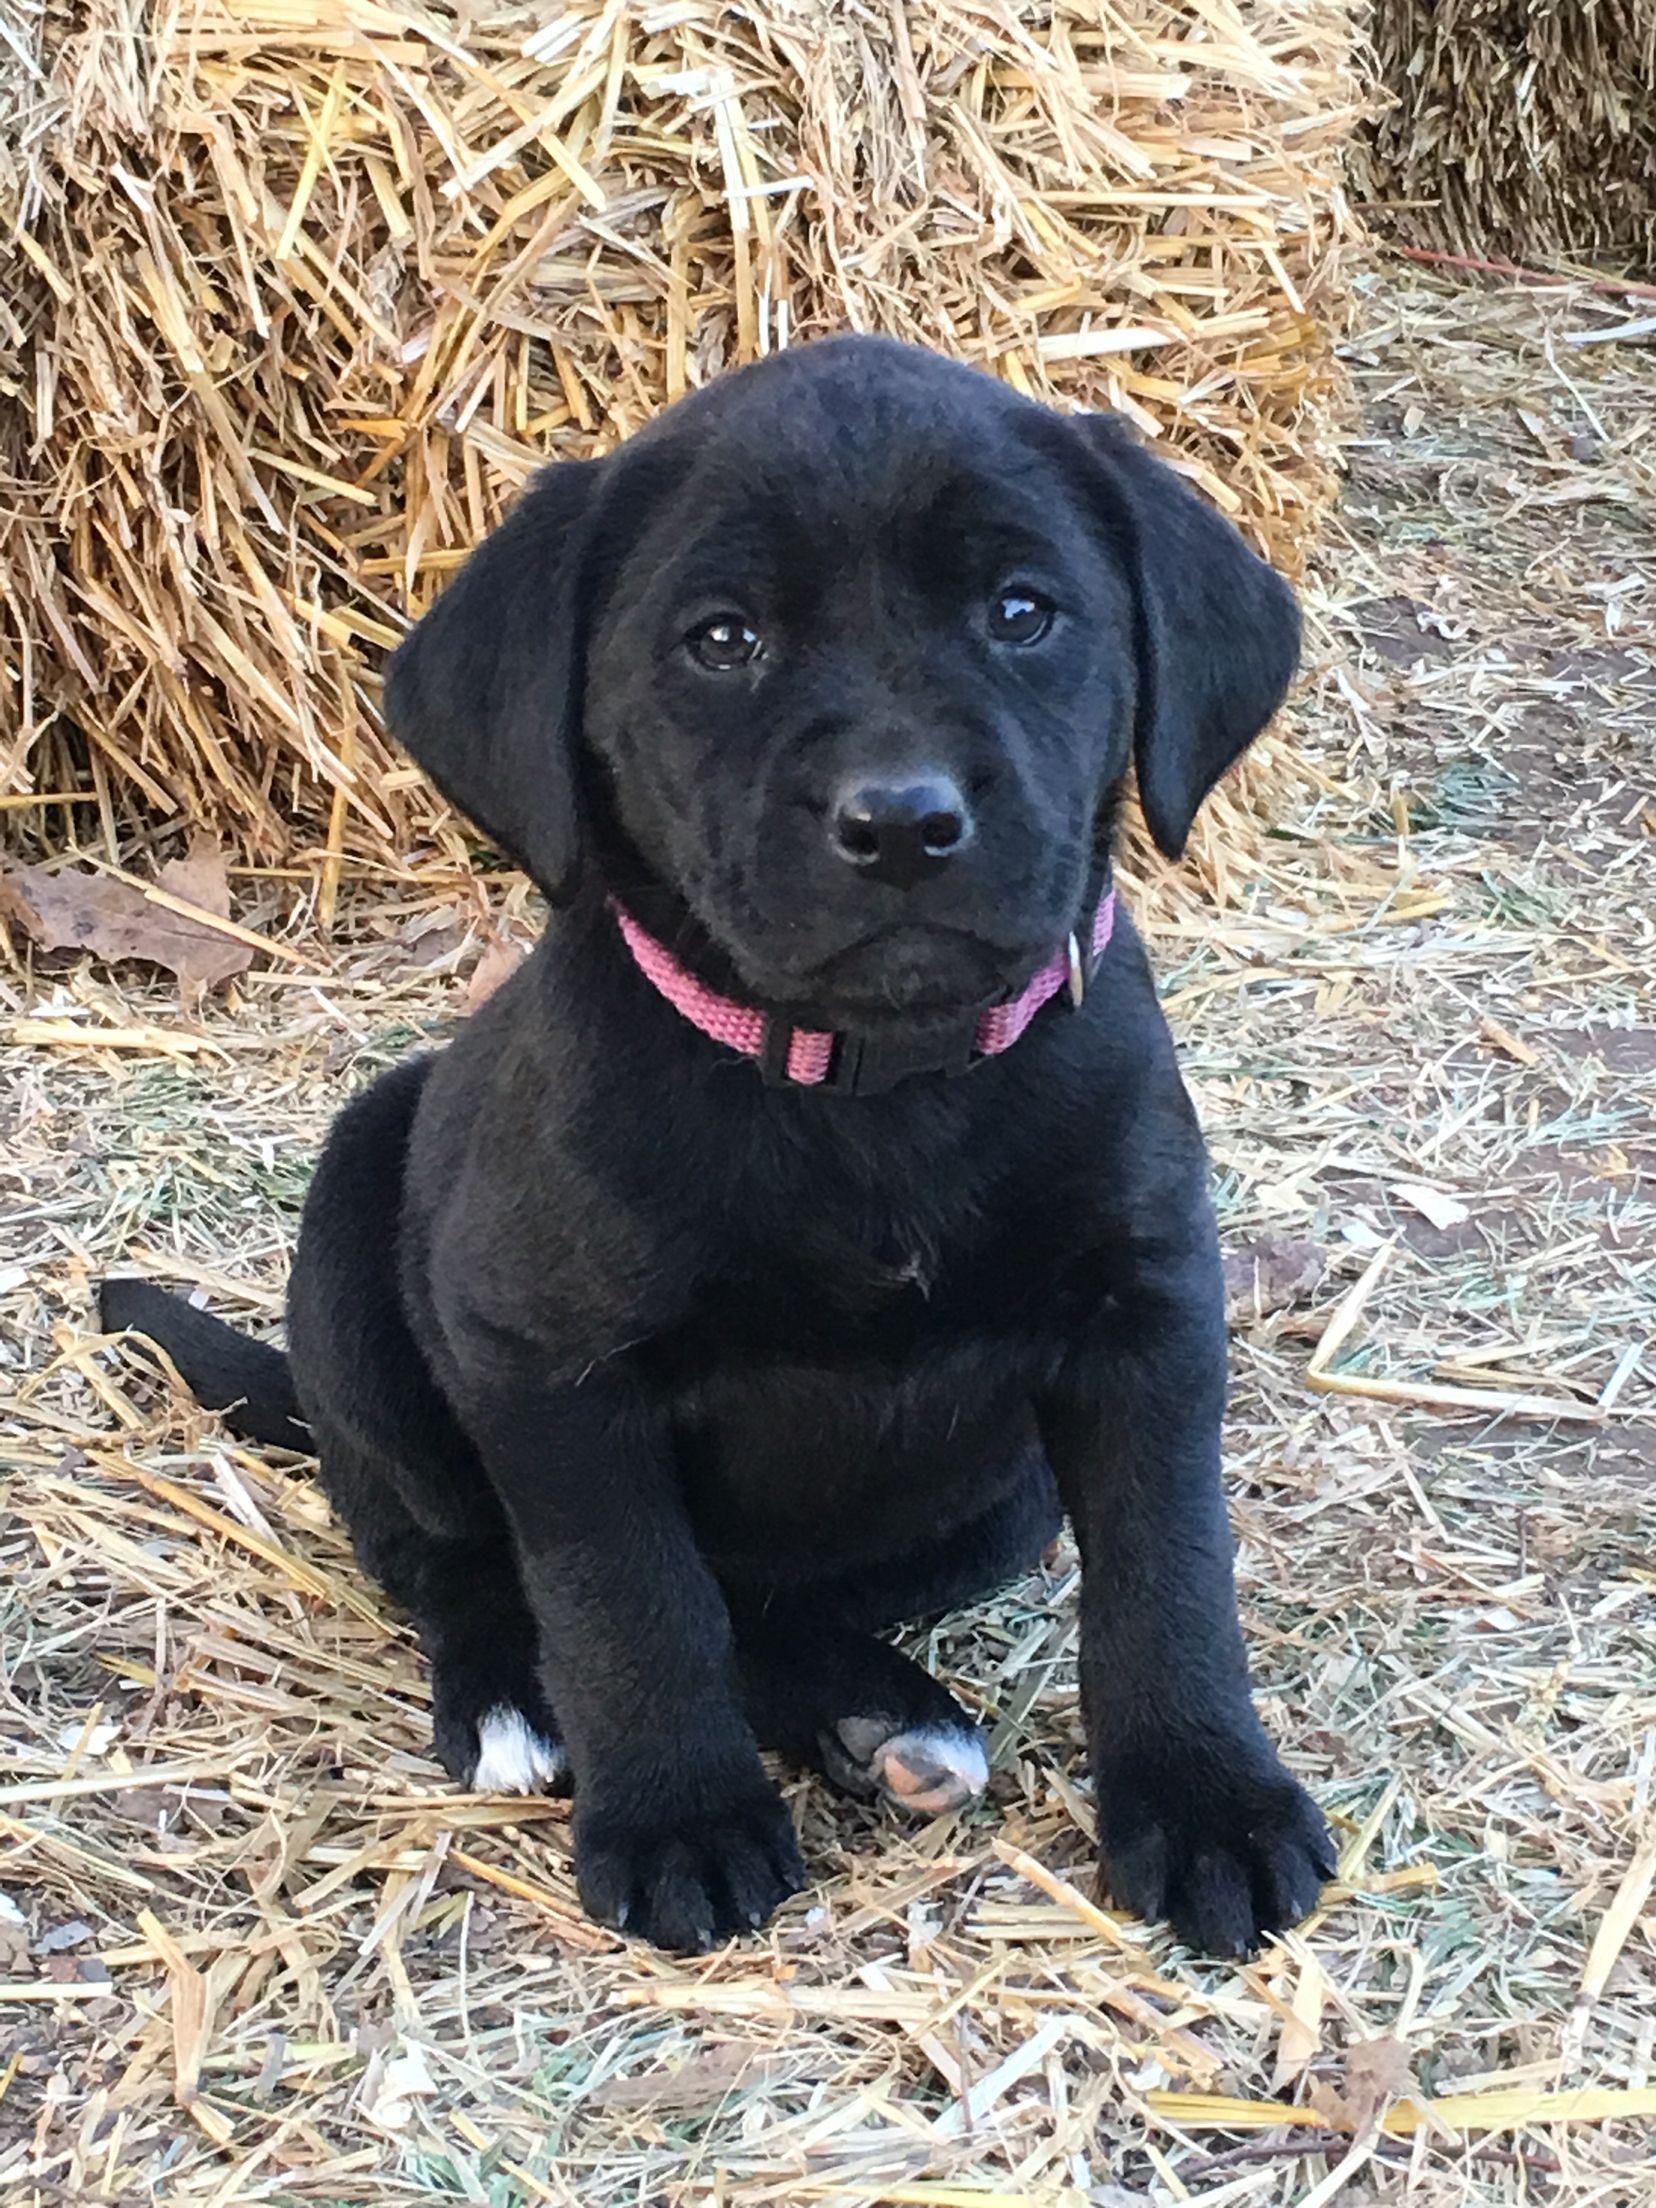 Black labrador retriever from windy hill labradors in